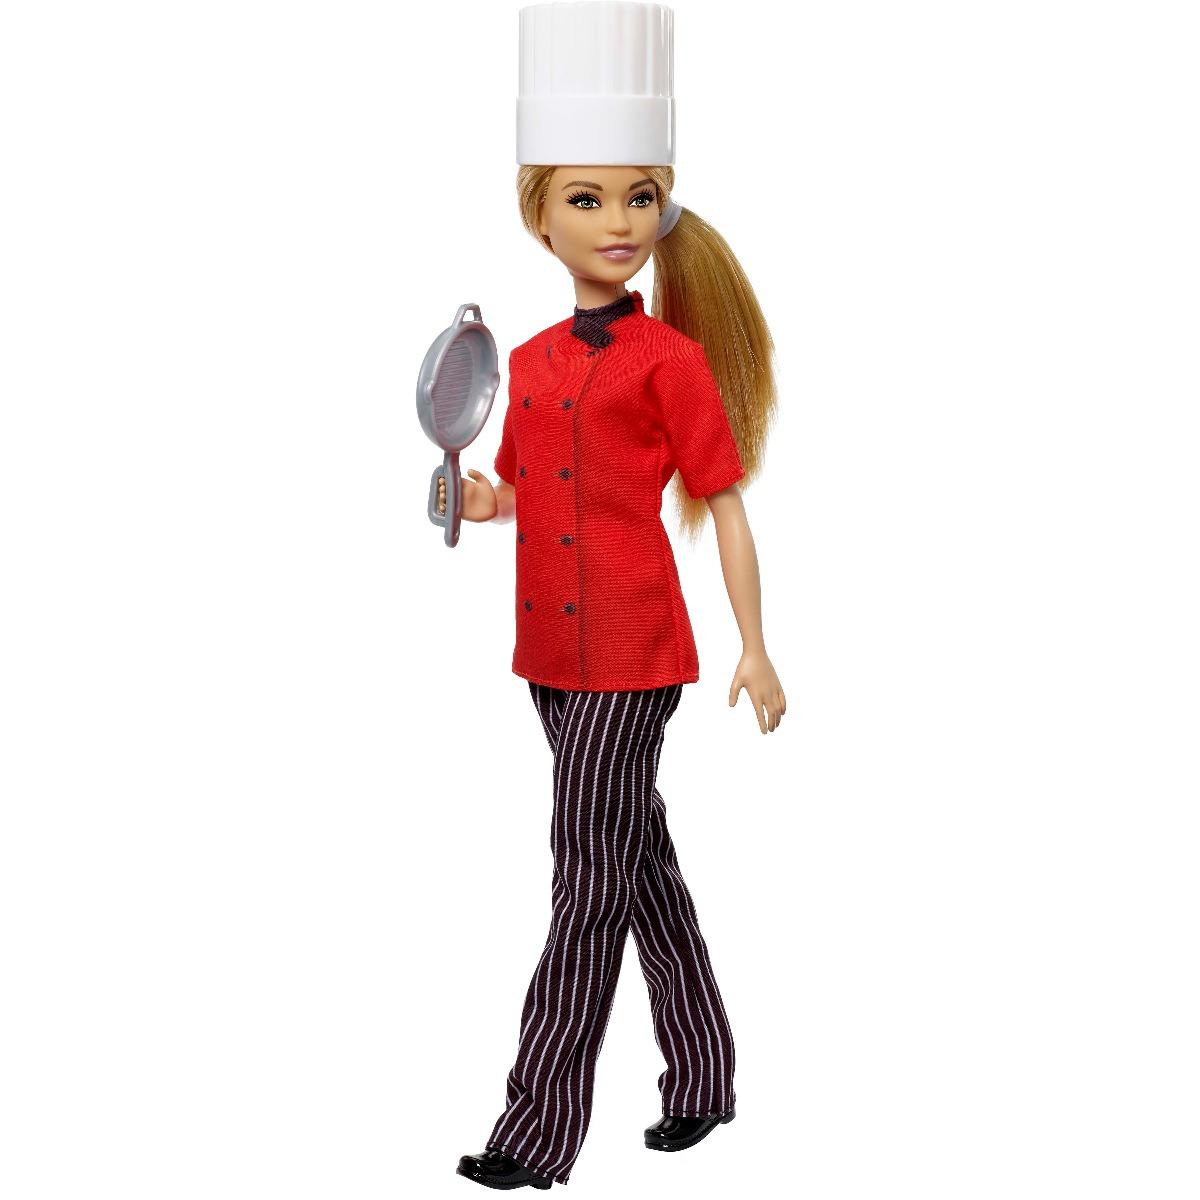 Papusa Barbie Career, Bucatar Sef imagine 2021